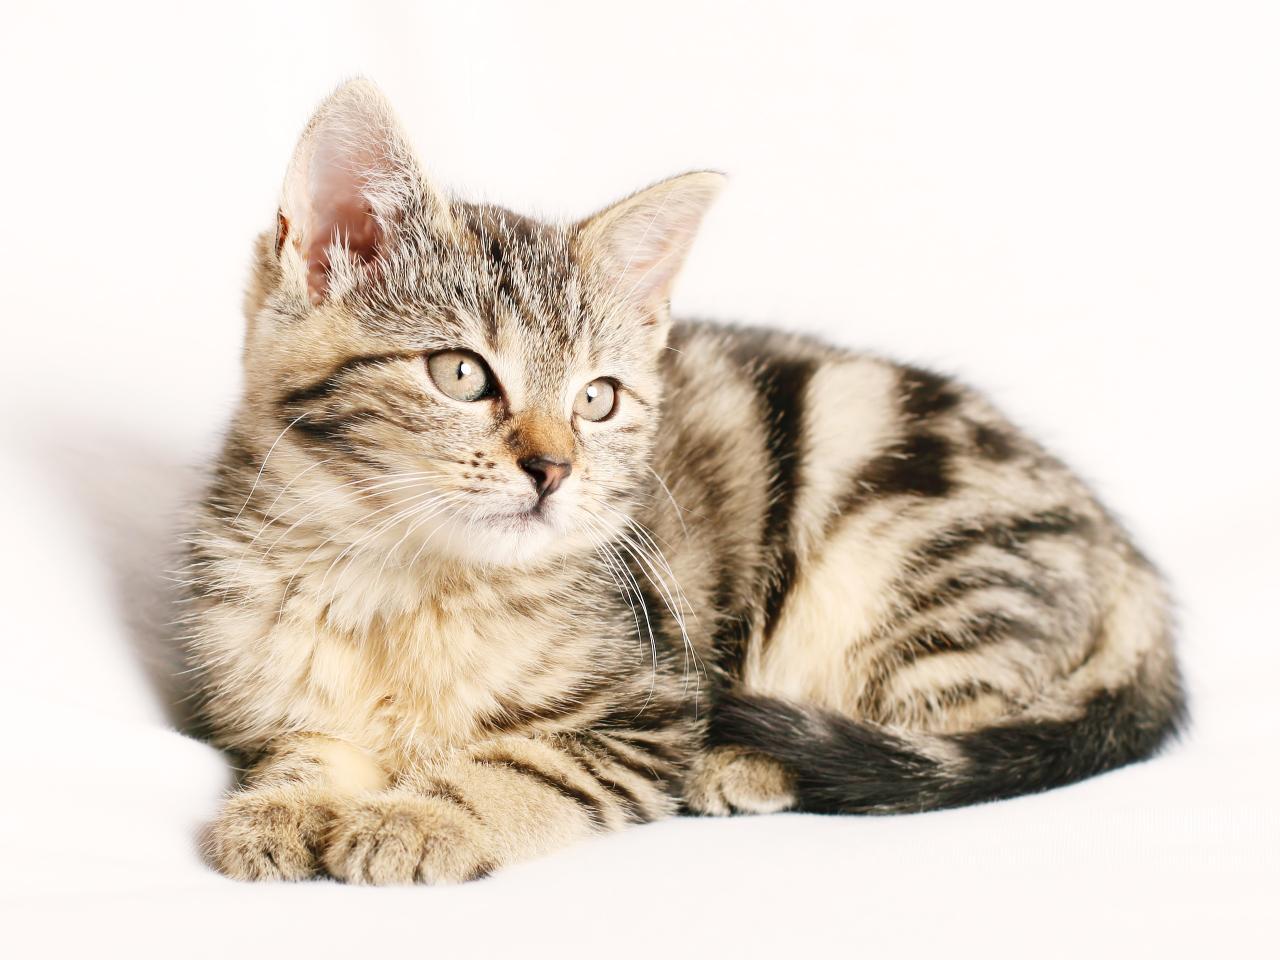 White background cat, Pose, Animal, pet, loyal, friend, animal, HQ Photo